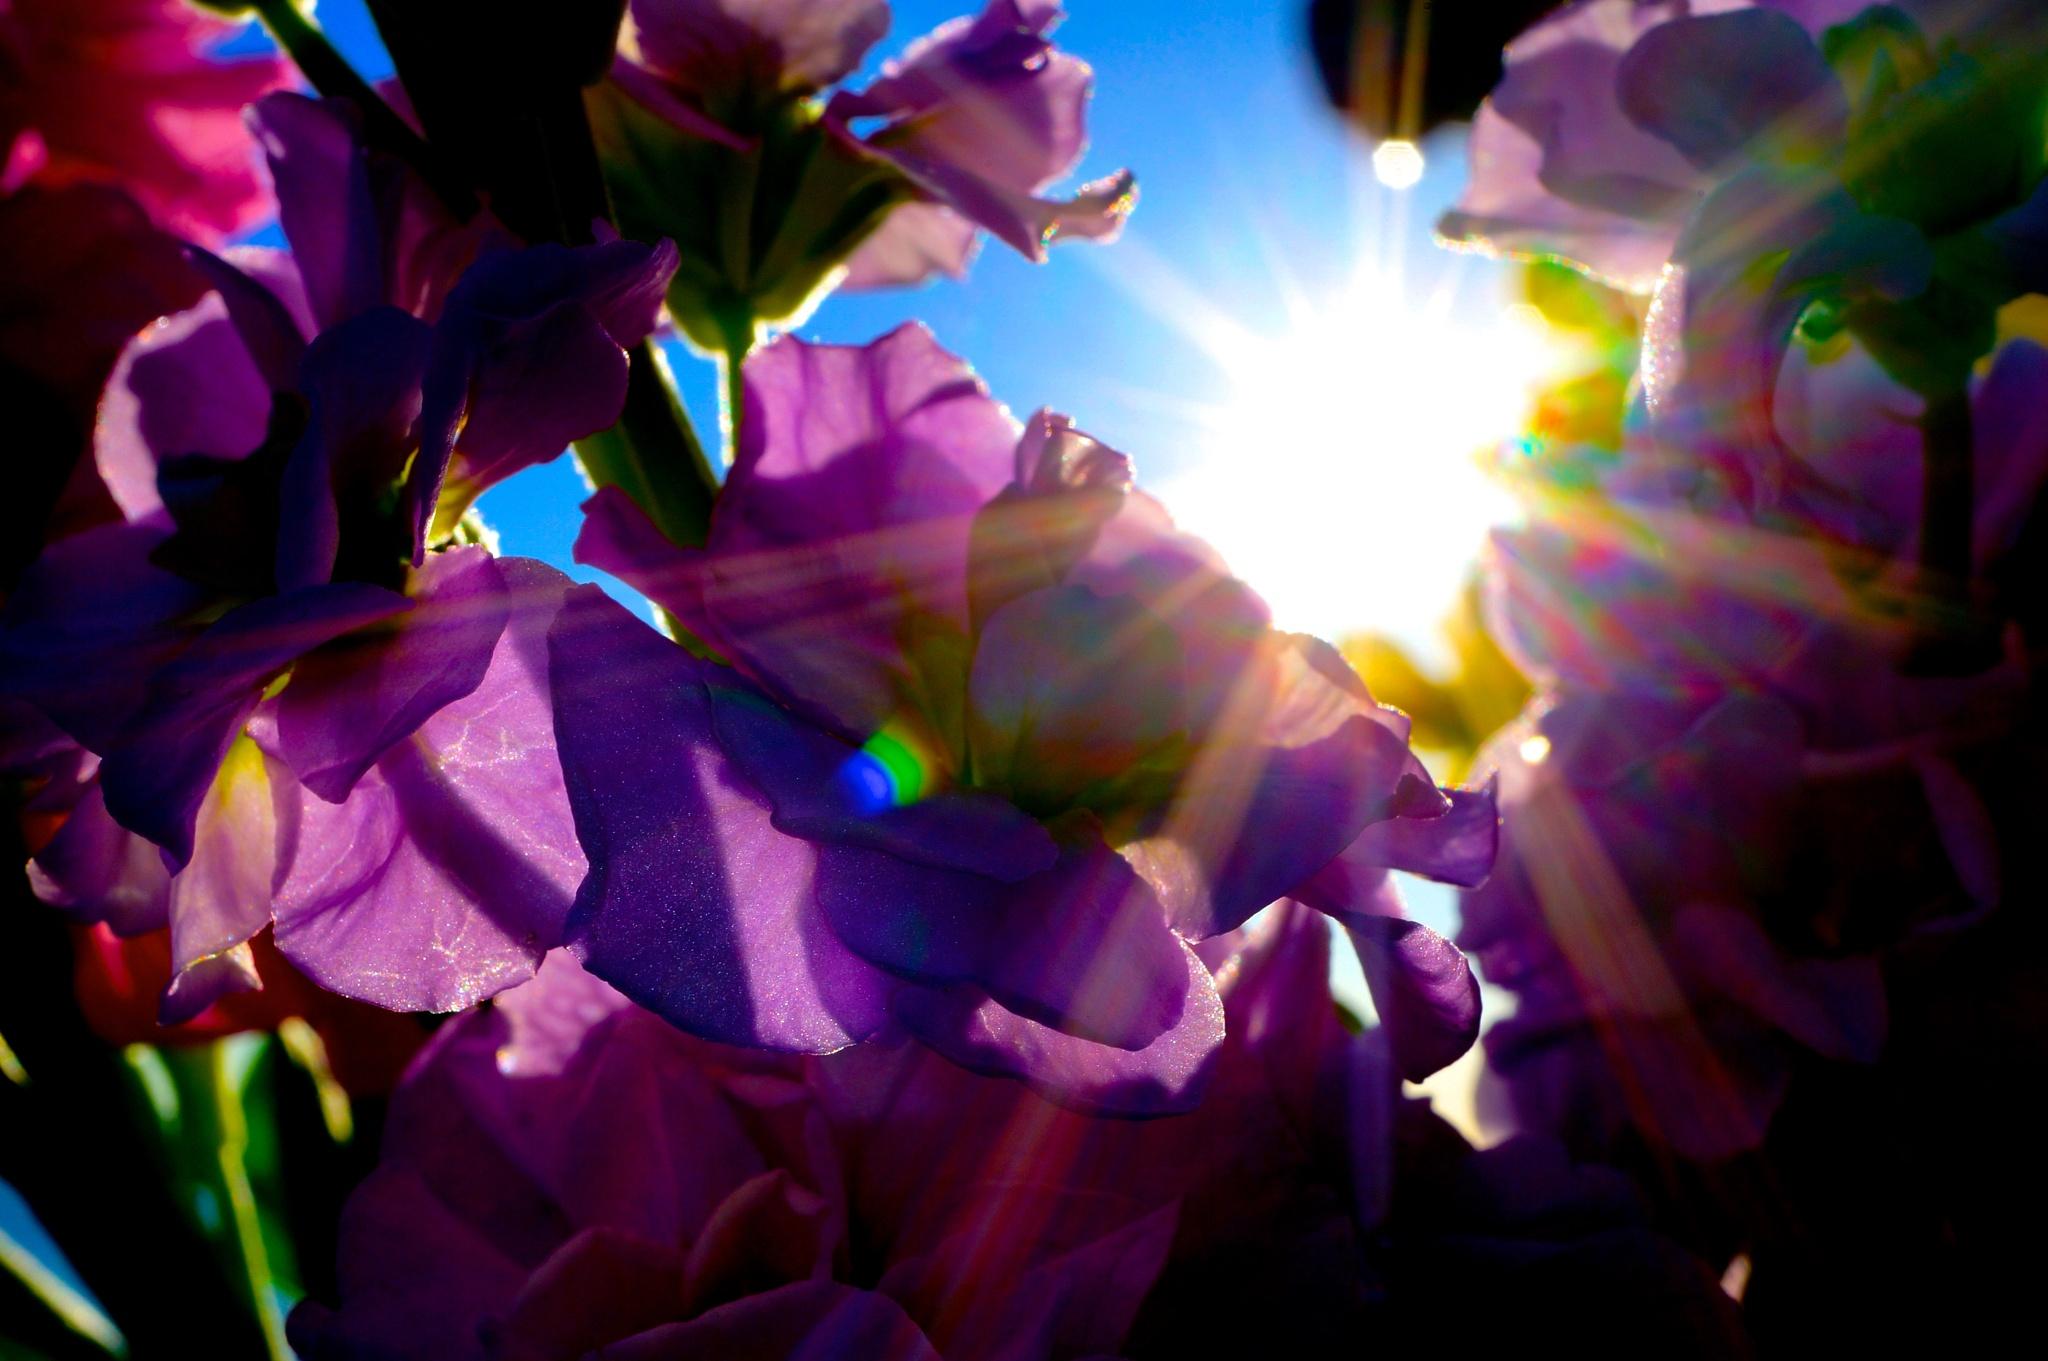 Through the Petals by emsgems